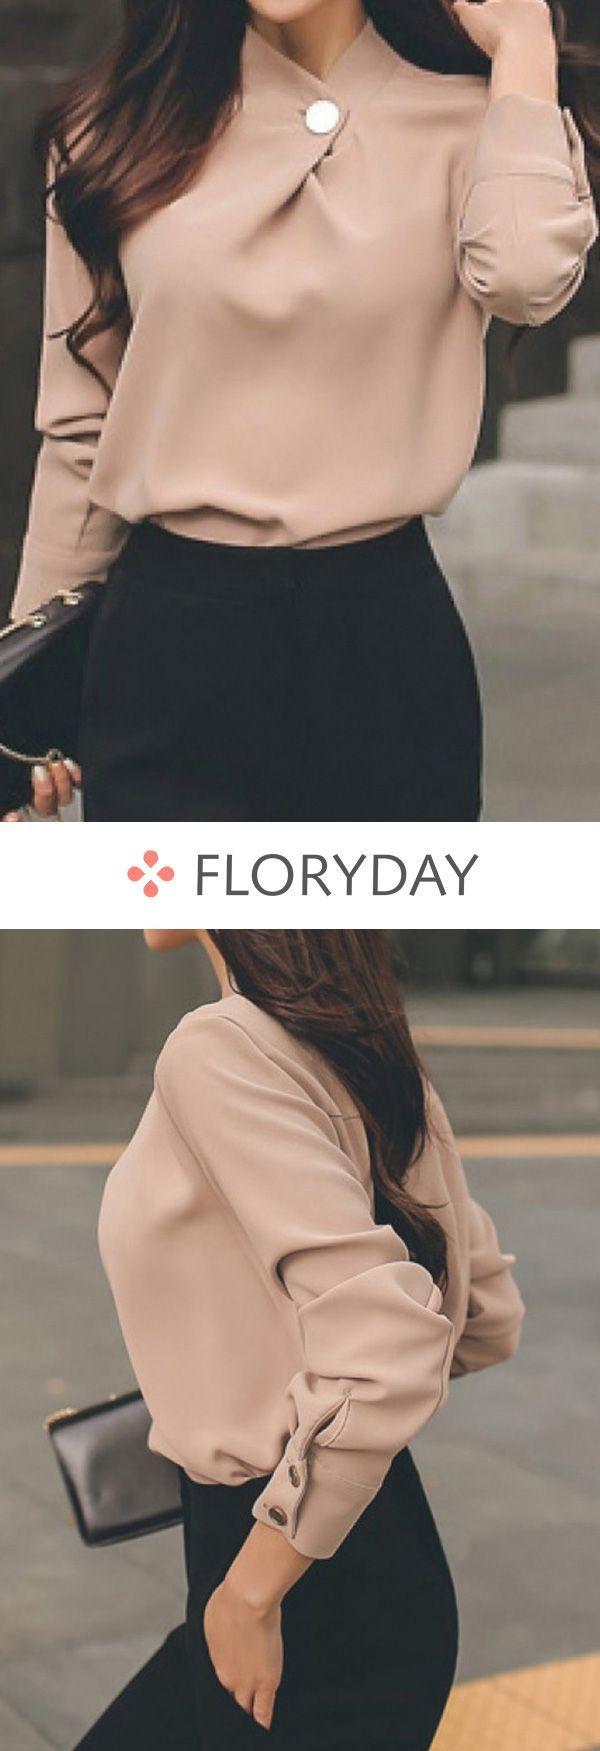 Solide Elegante Bluse Mit Hohem Halsausschnitt Solide Elegante Bluse mit hohem Halsausschnitt Woman Shirts women's blouses and tops